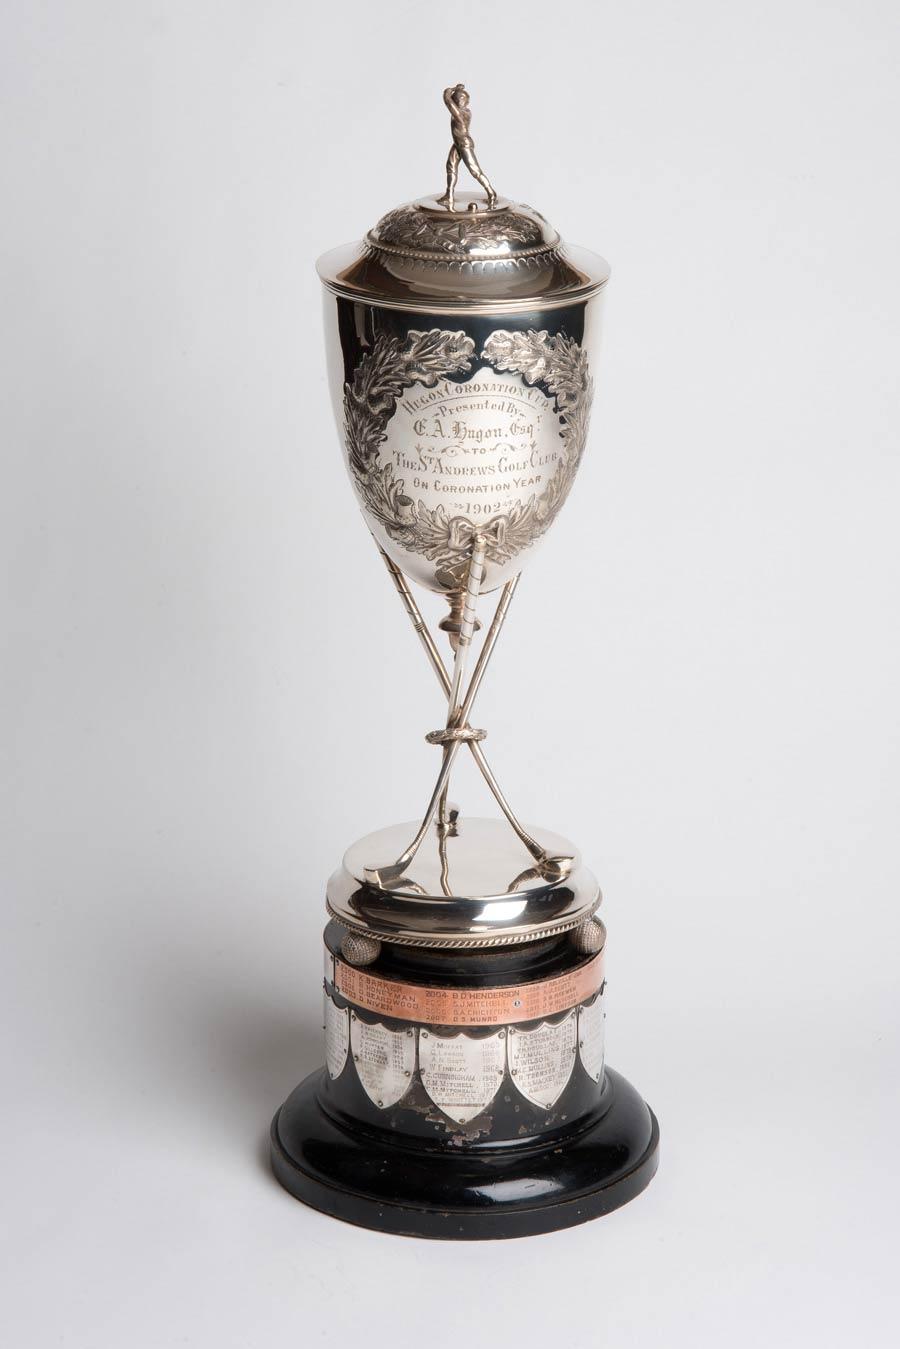 The Hugon Cup